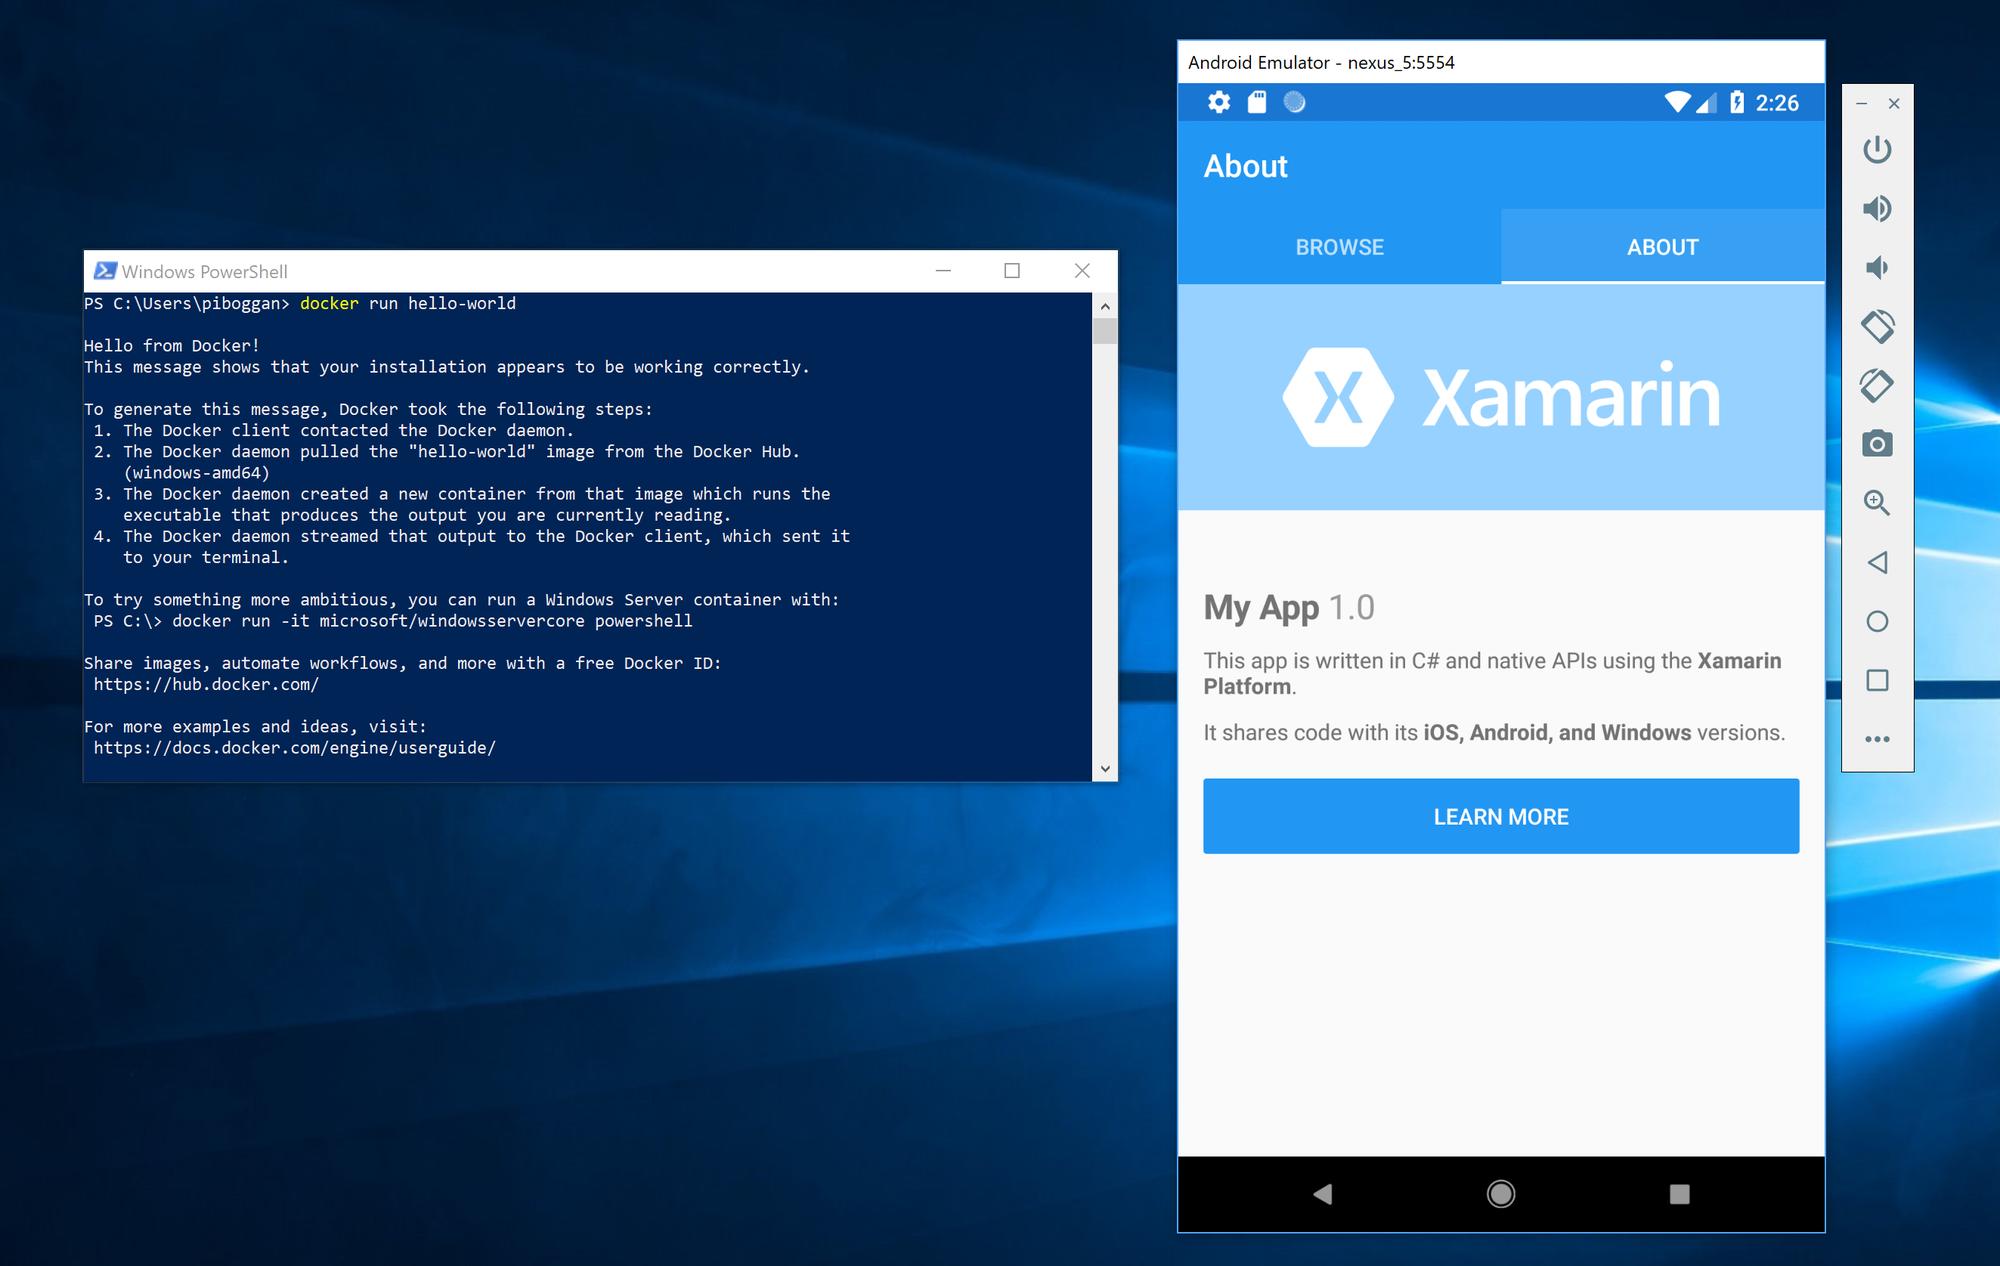 Android emulator not on Windows Store as claimed? HyperV-Emulator-Docker.png